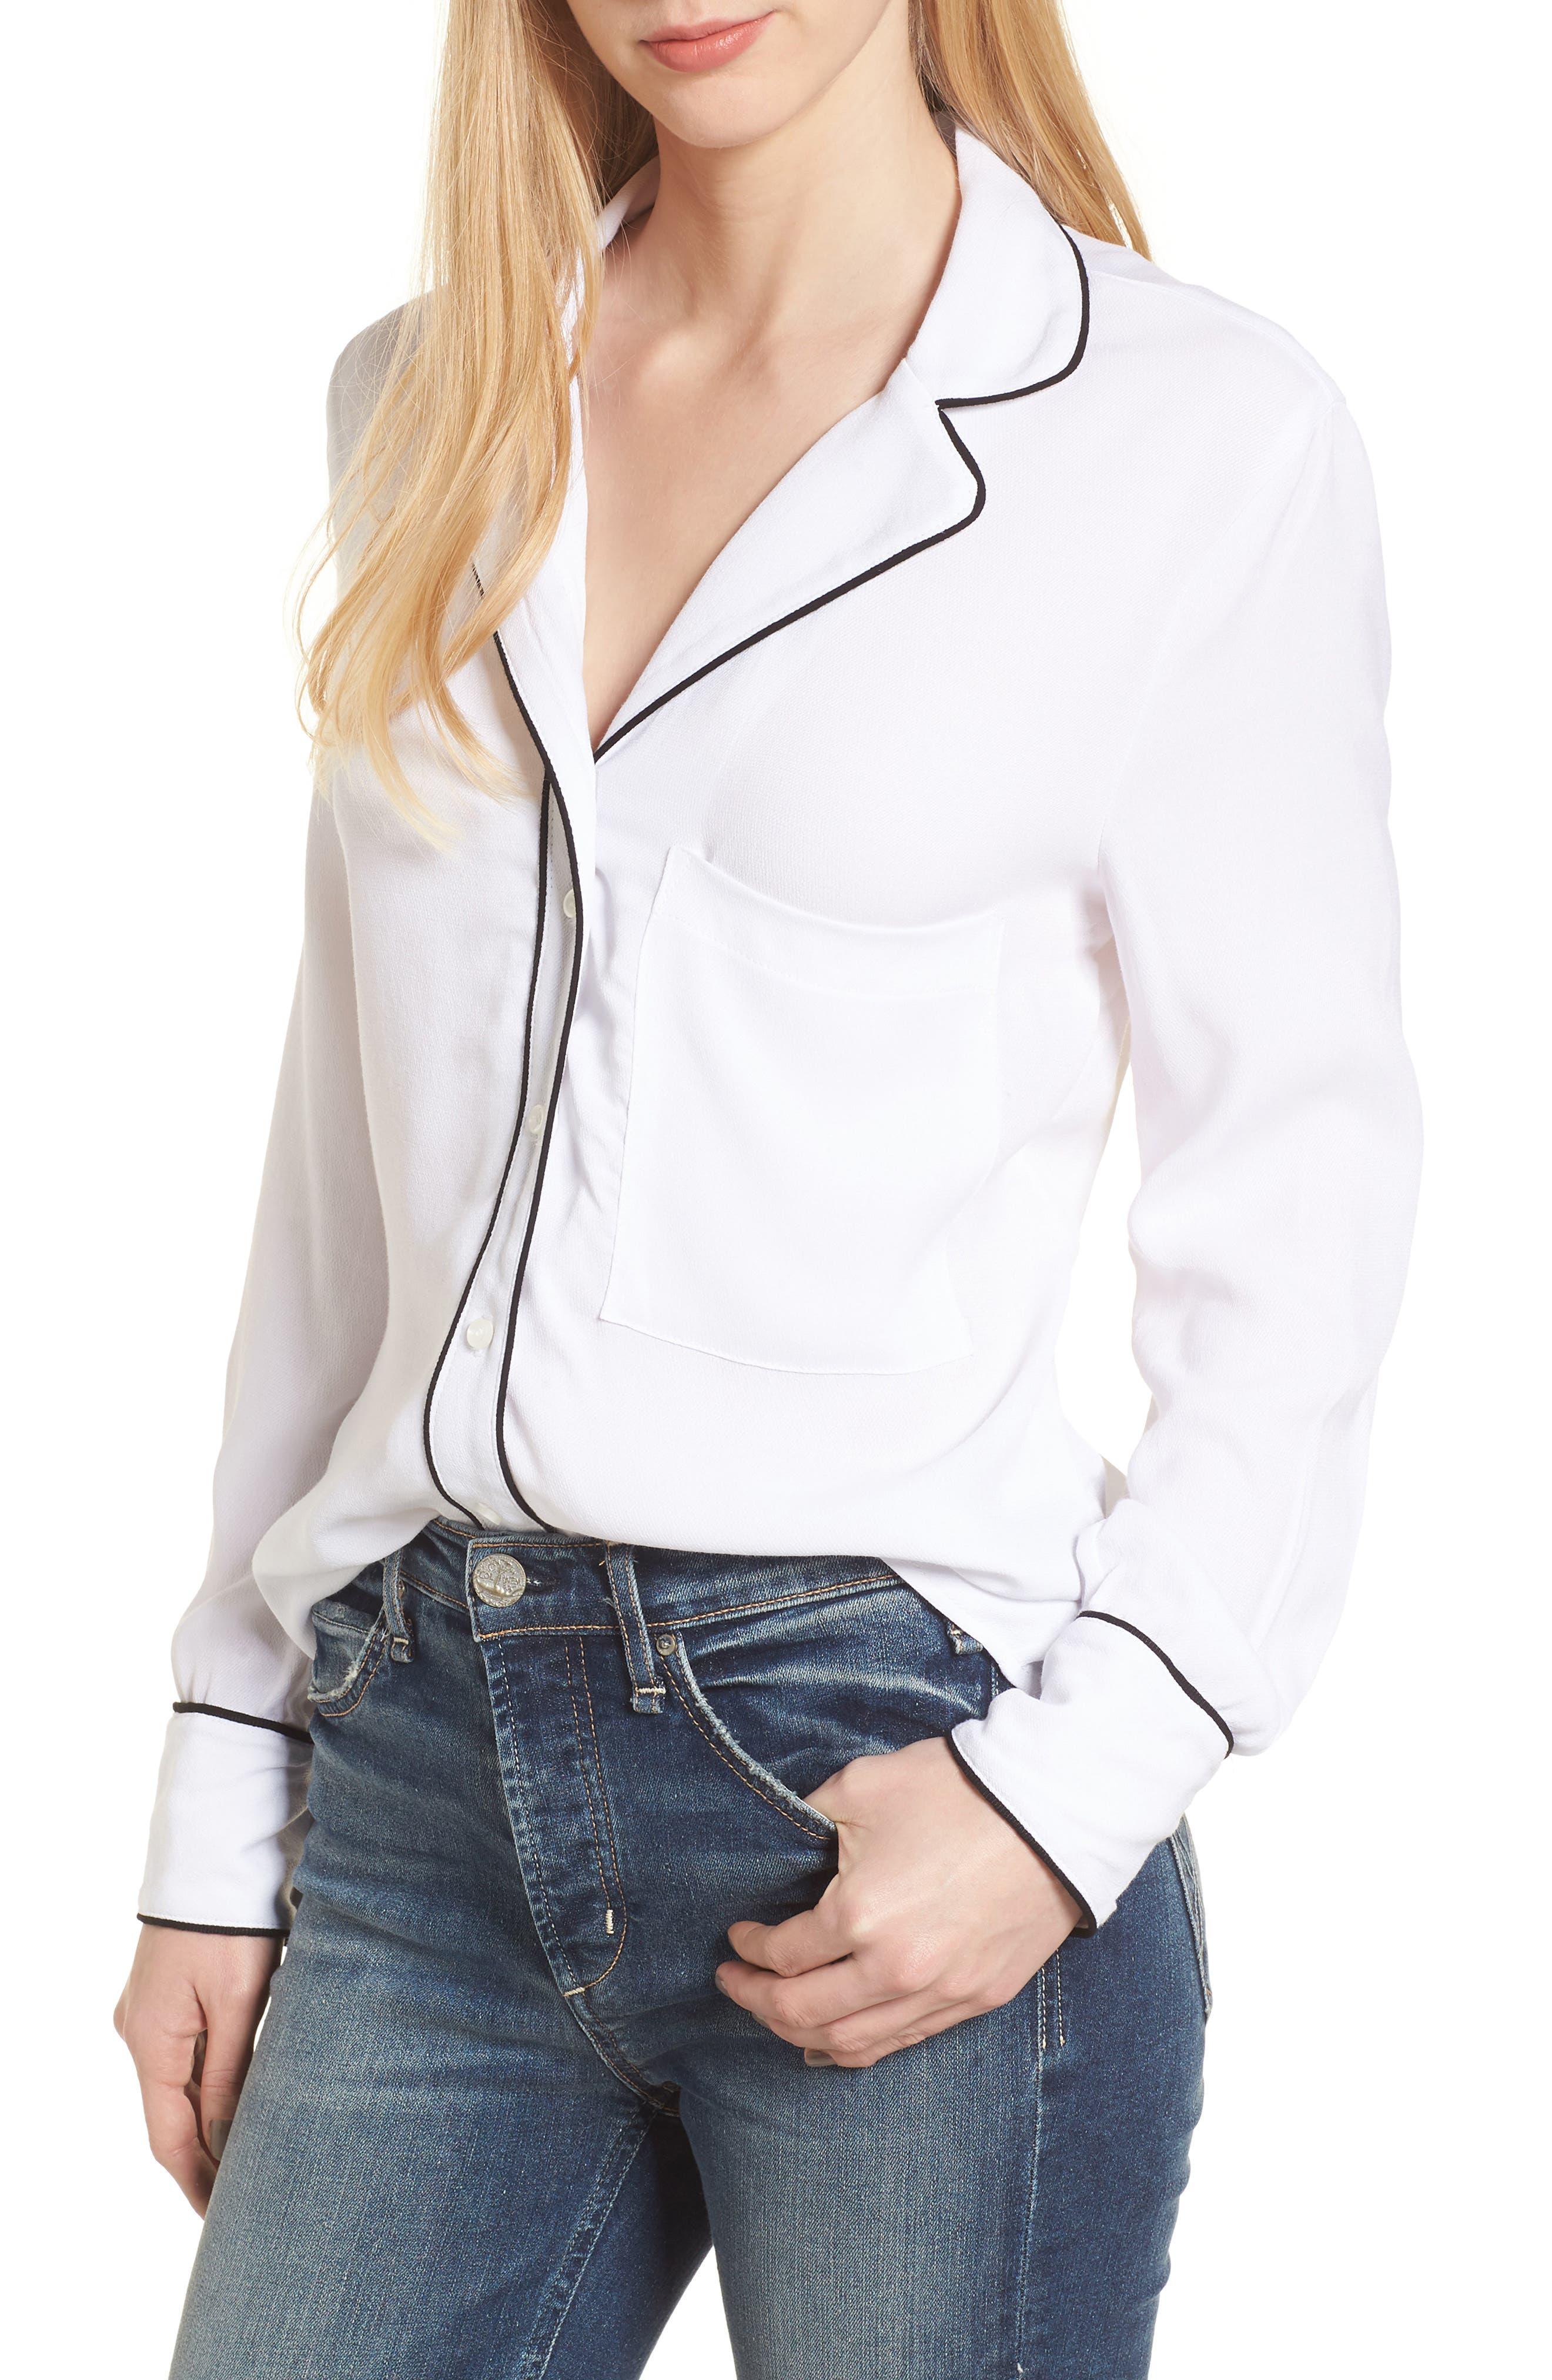 Rossi Pajama Top,                         Main,                         color, 100